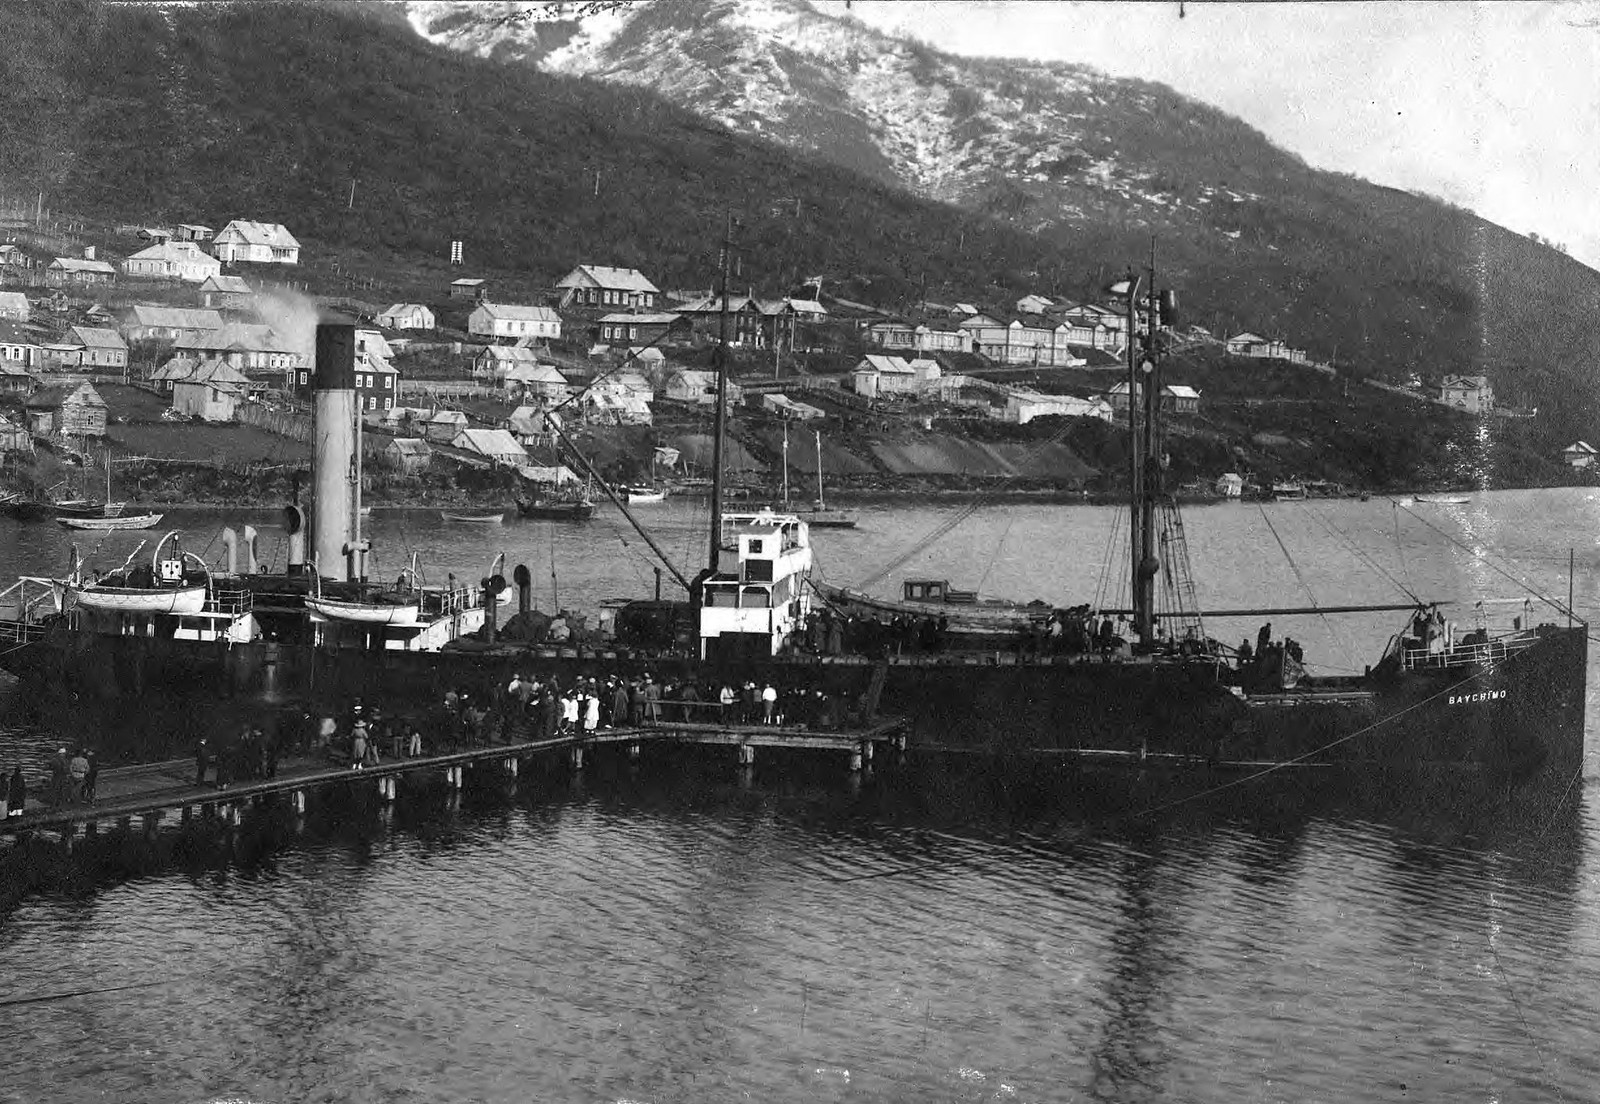 1910. У пристани Добровольного флота